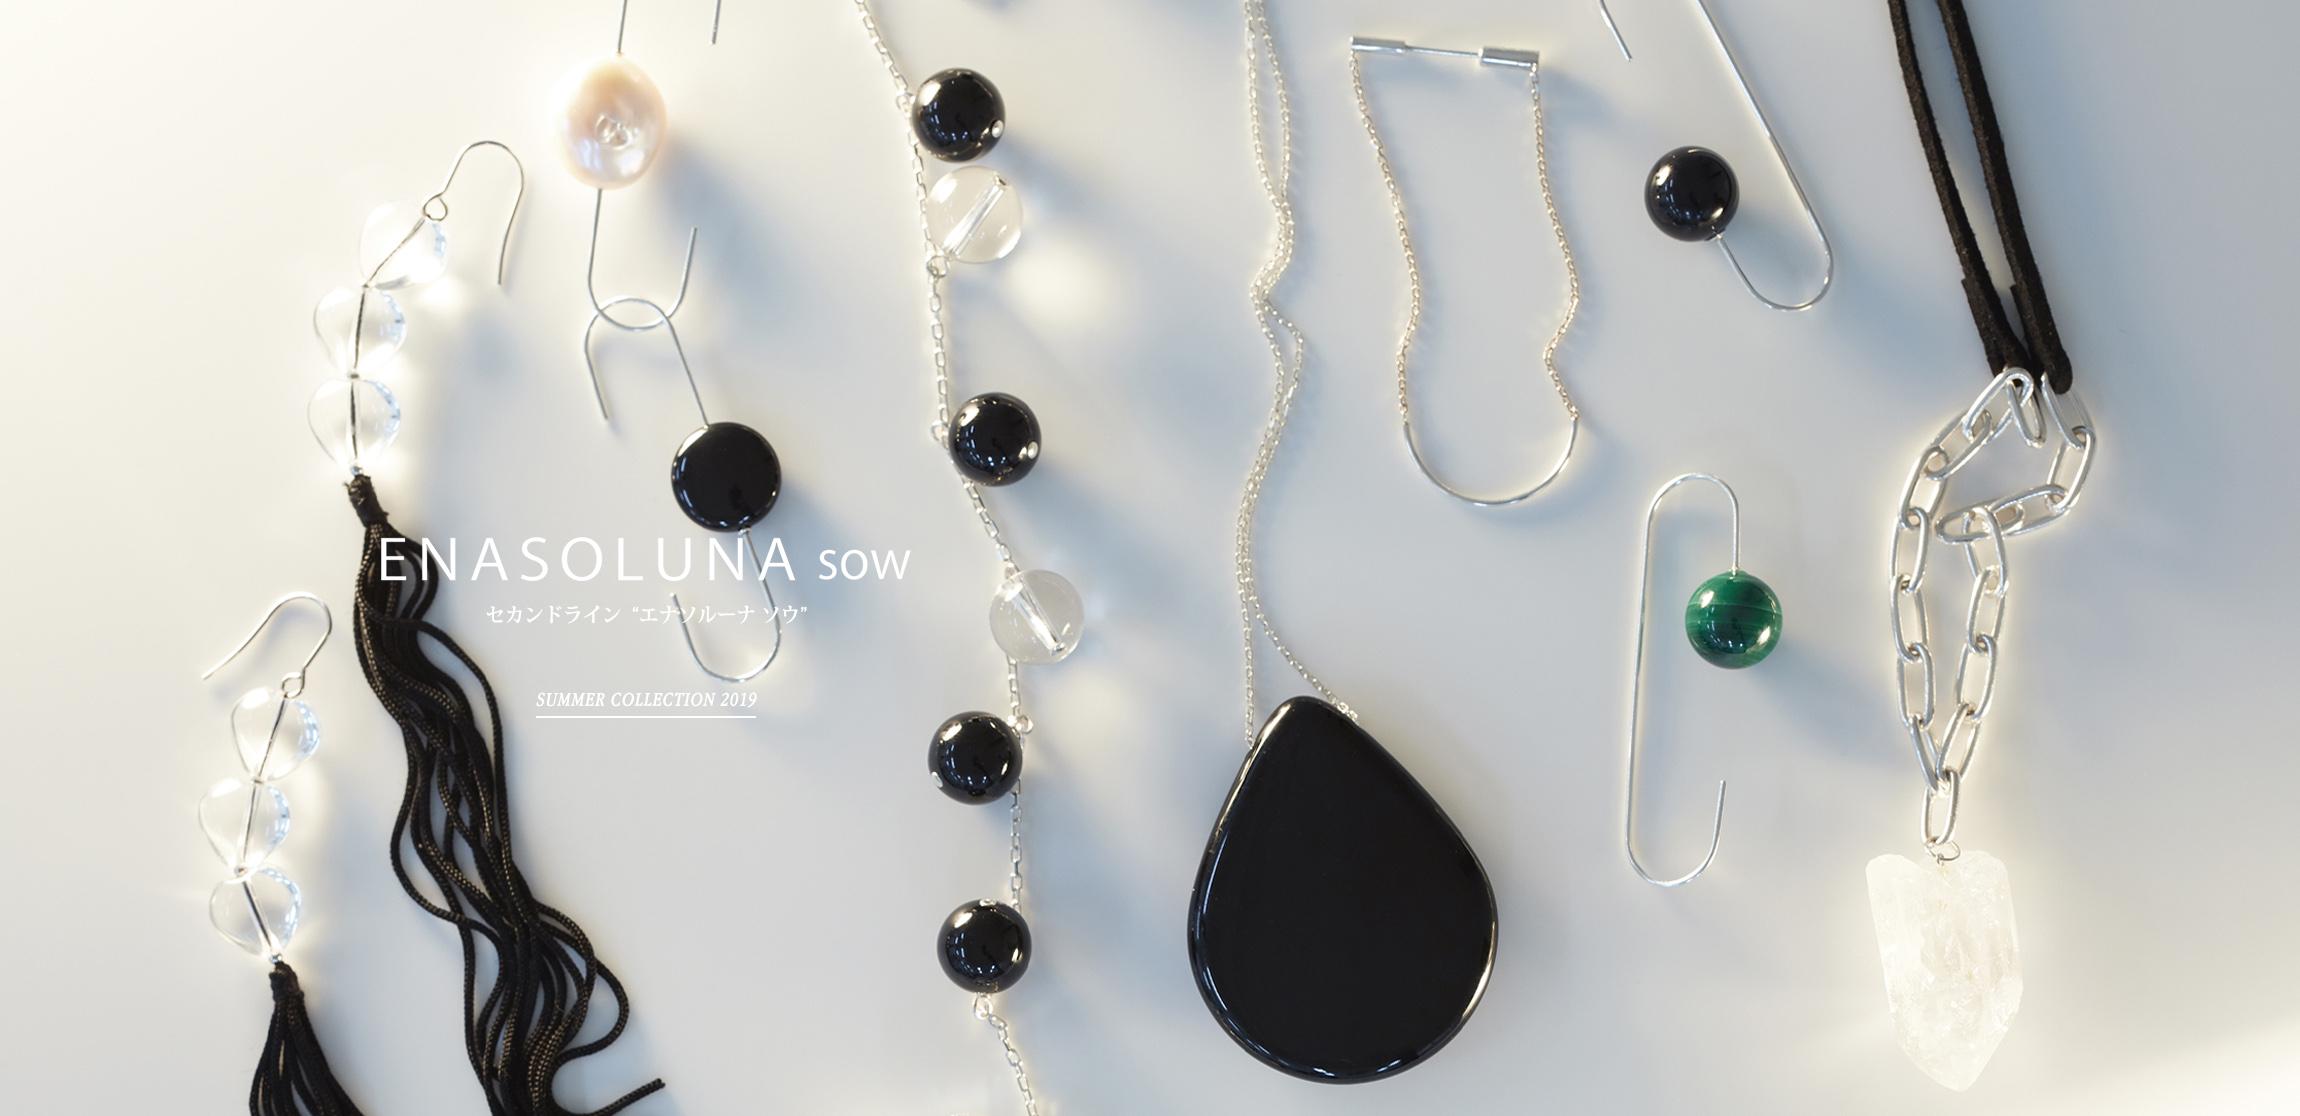 ENASOLUNA sow Summer collection